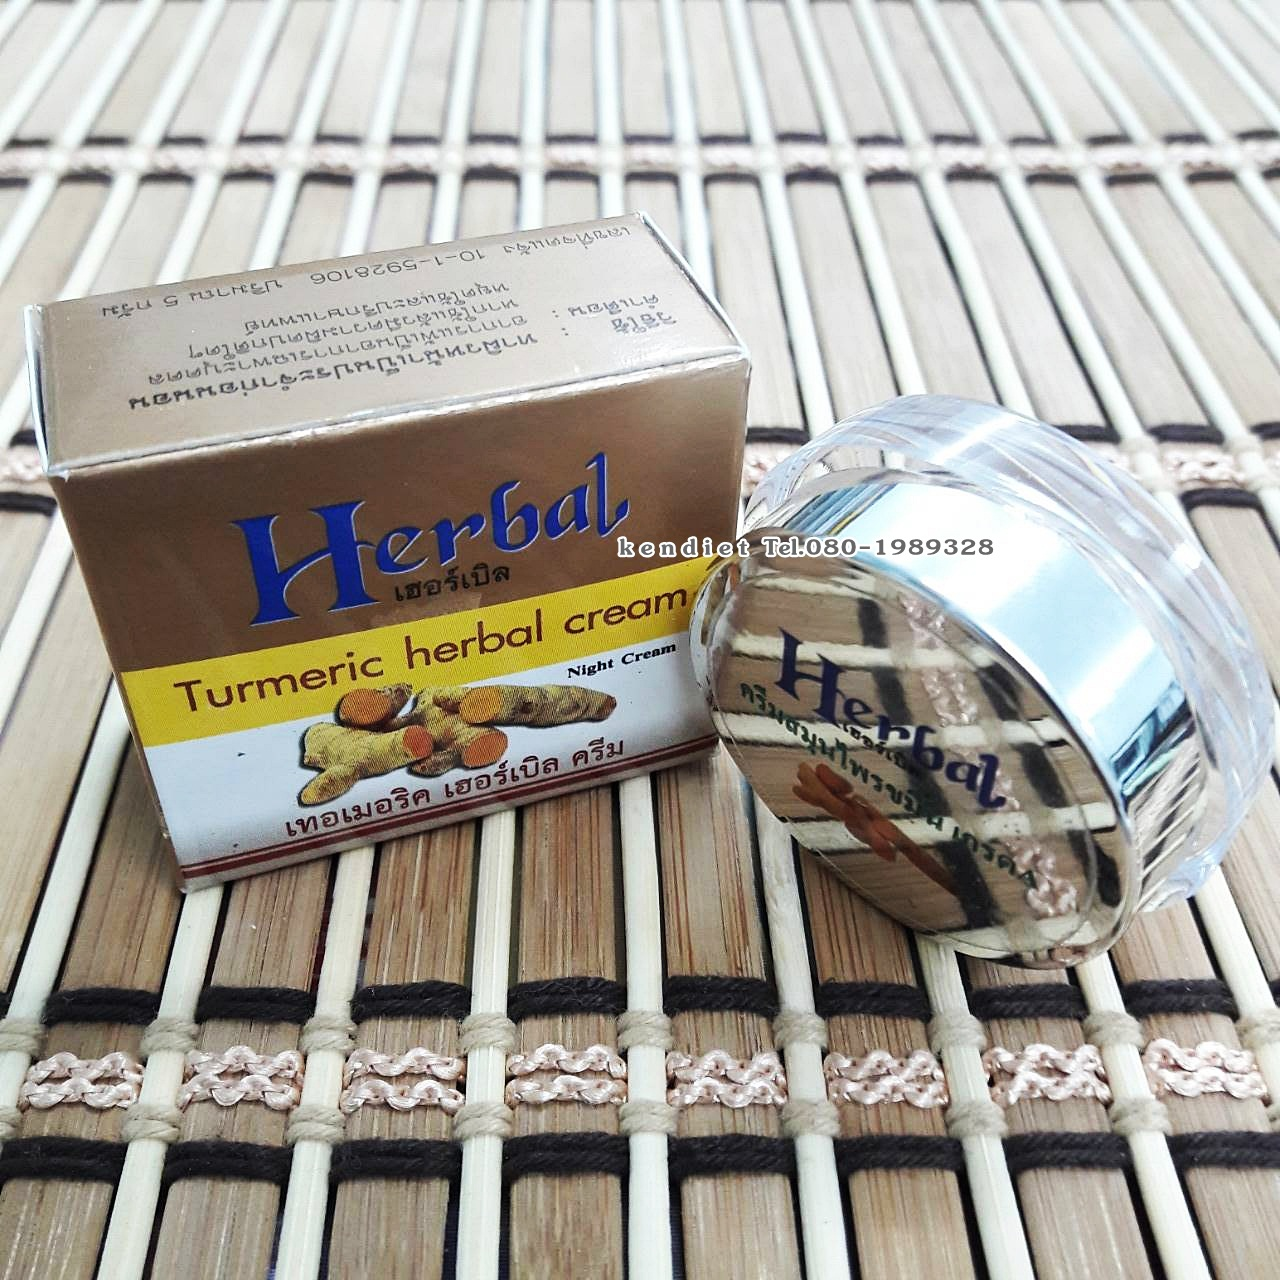 Termeric Herbal Cream Night Cream เทอร์มิริค เฮอร์เบิล ครีม ครีมขมิ้นบำรุงผิวหน้า